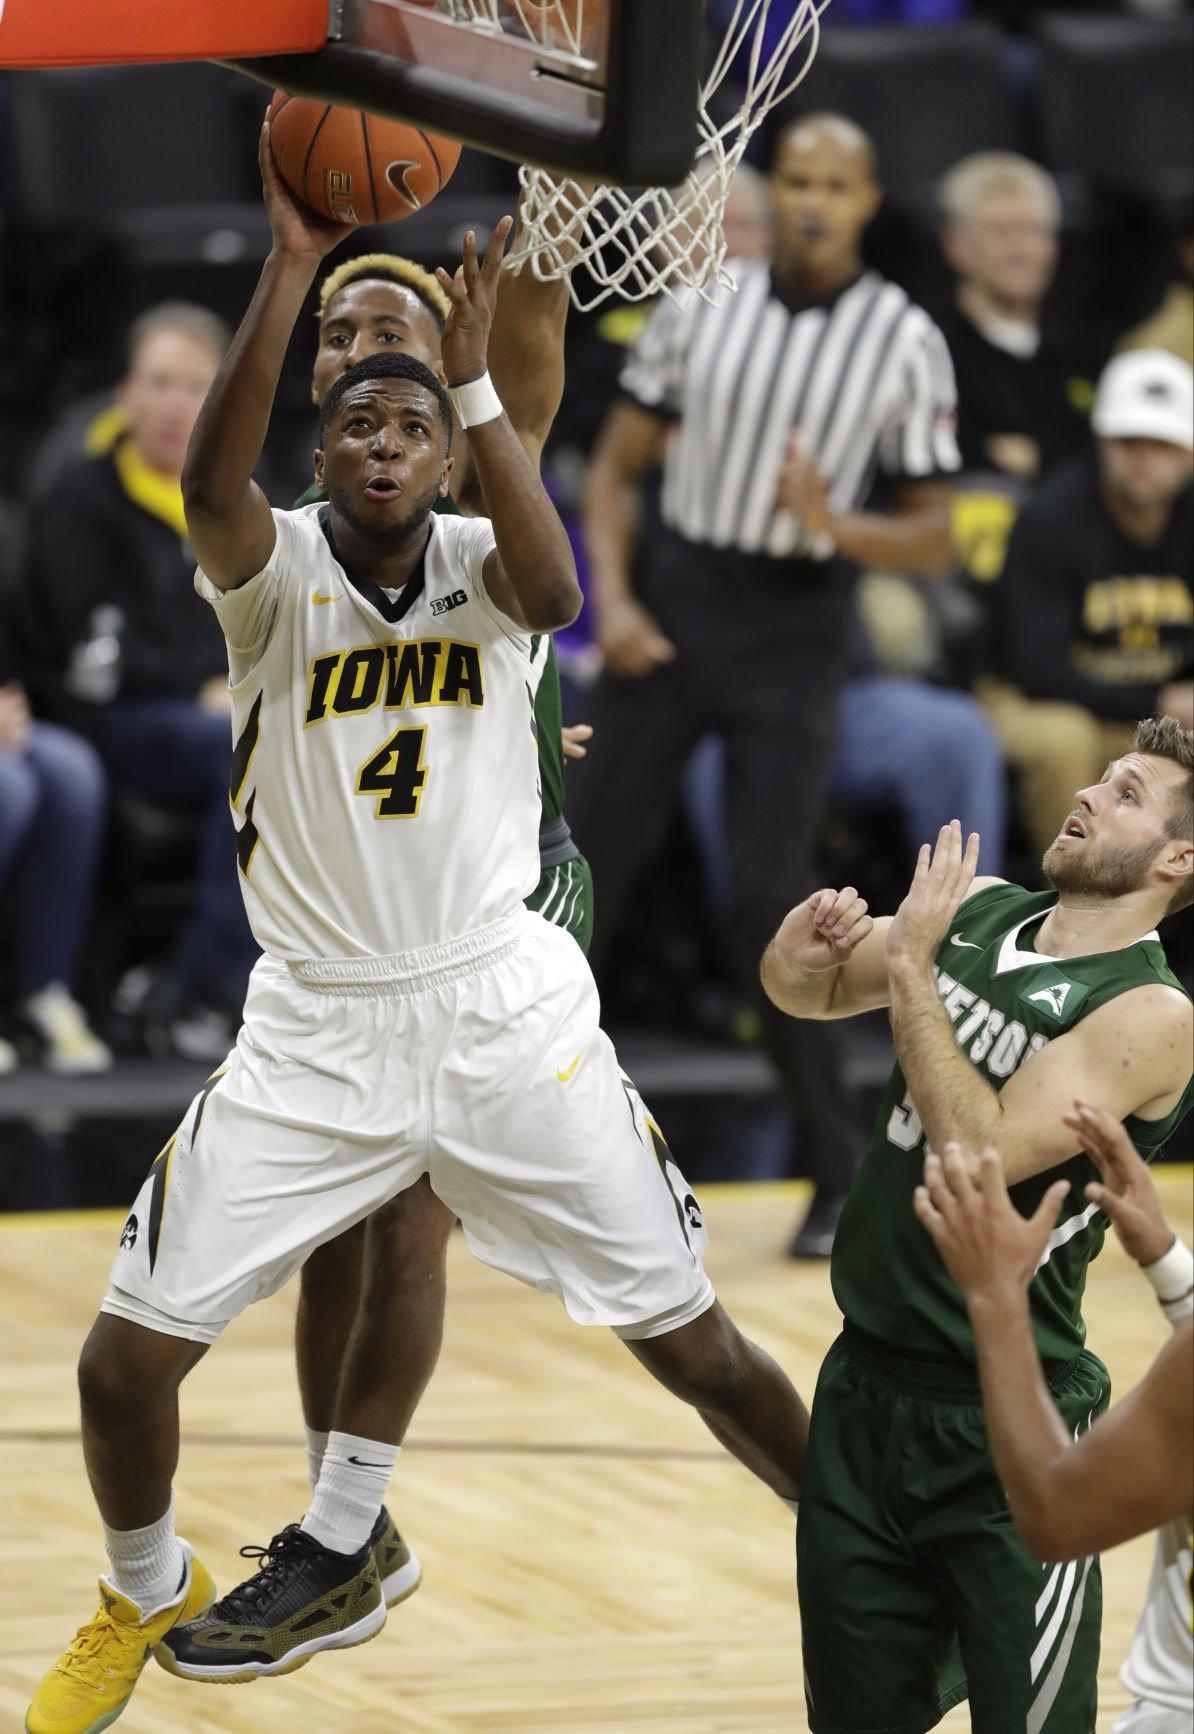 iowa basketball - photo #33